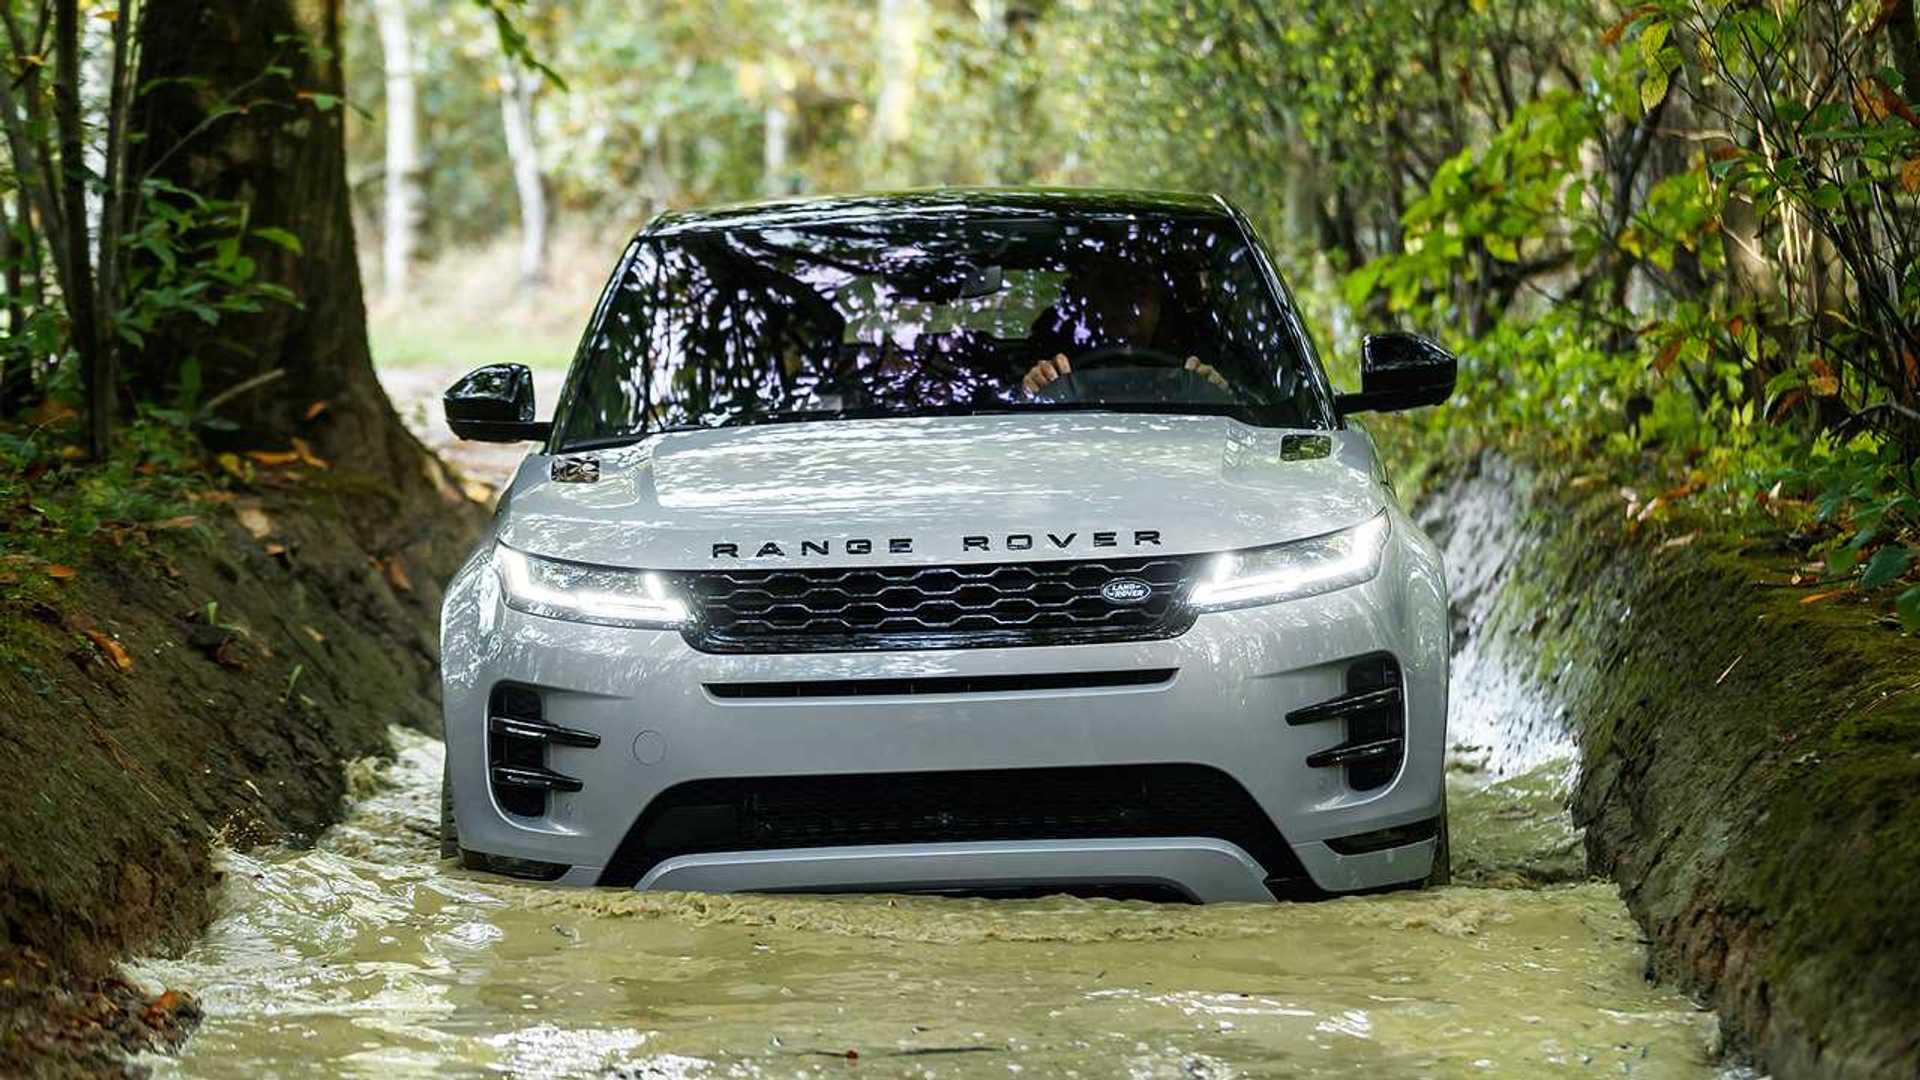 2020 Range Rover Evoque Debuts All New Design Mild Hybrid Tech